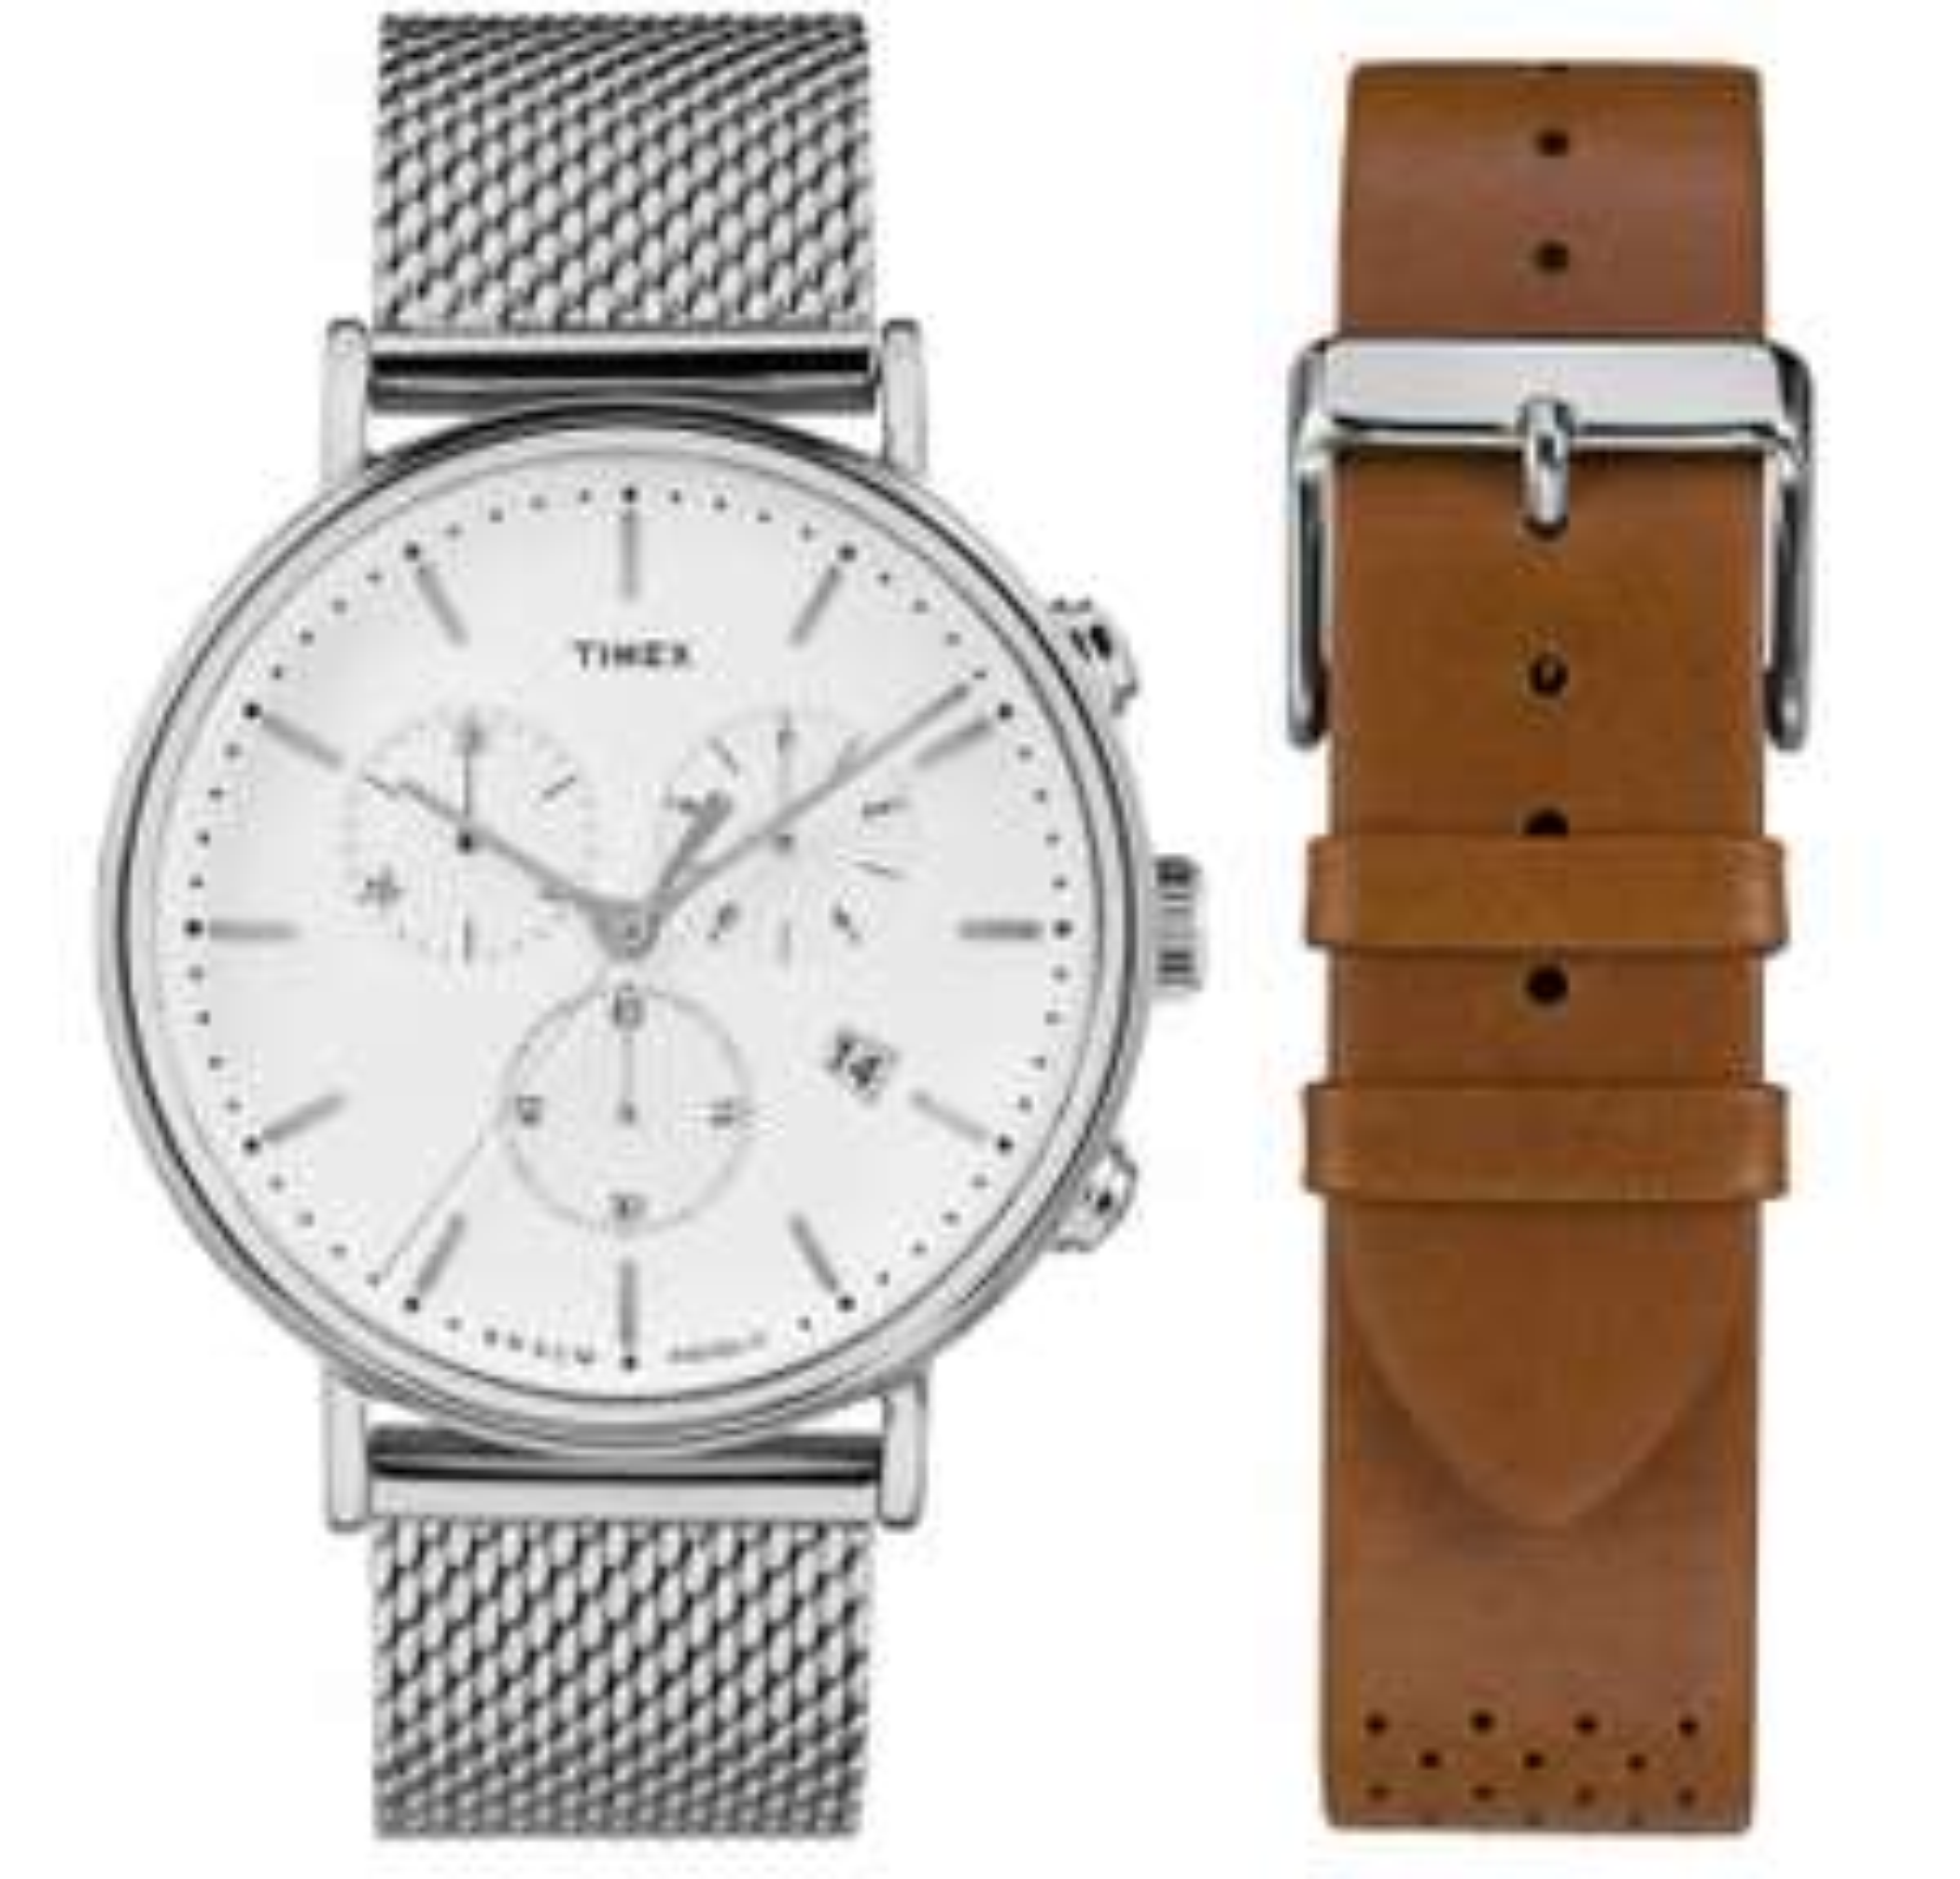 Zegarek męski Timex Chrono bransoleta + pasek [Allegro]